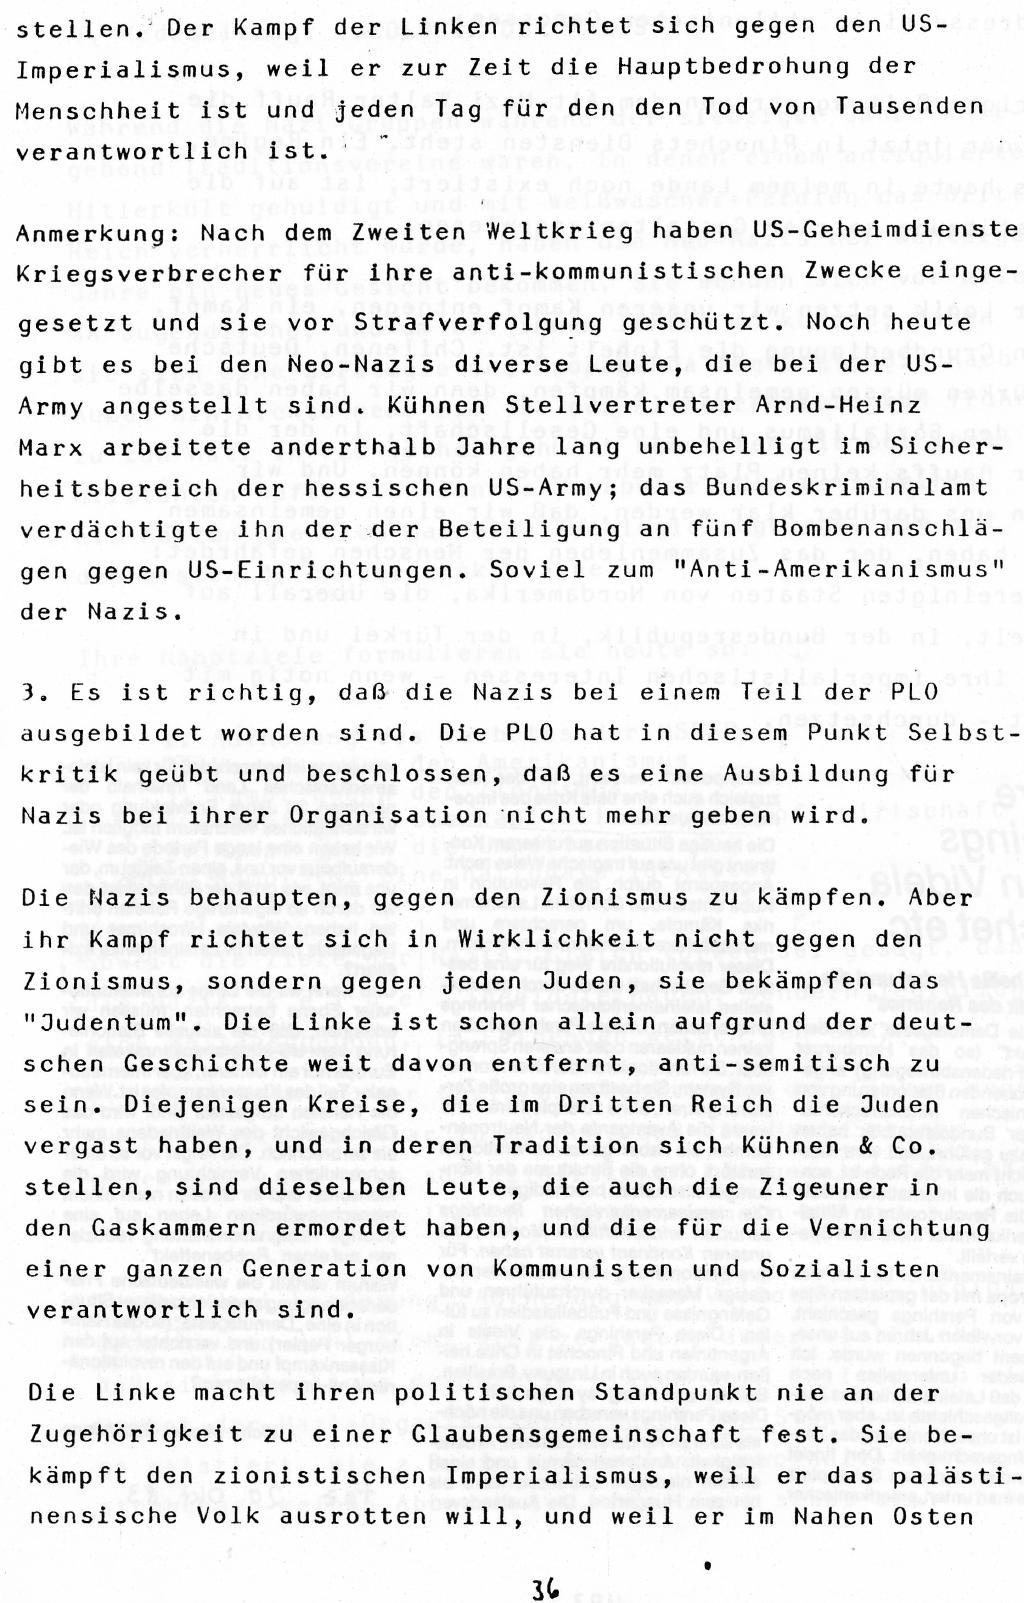 Berlin_1983_Autonome_Gruppen_Faschismus_im_Kapitalismus_36